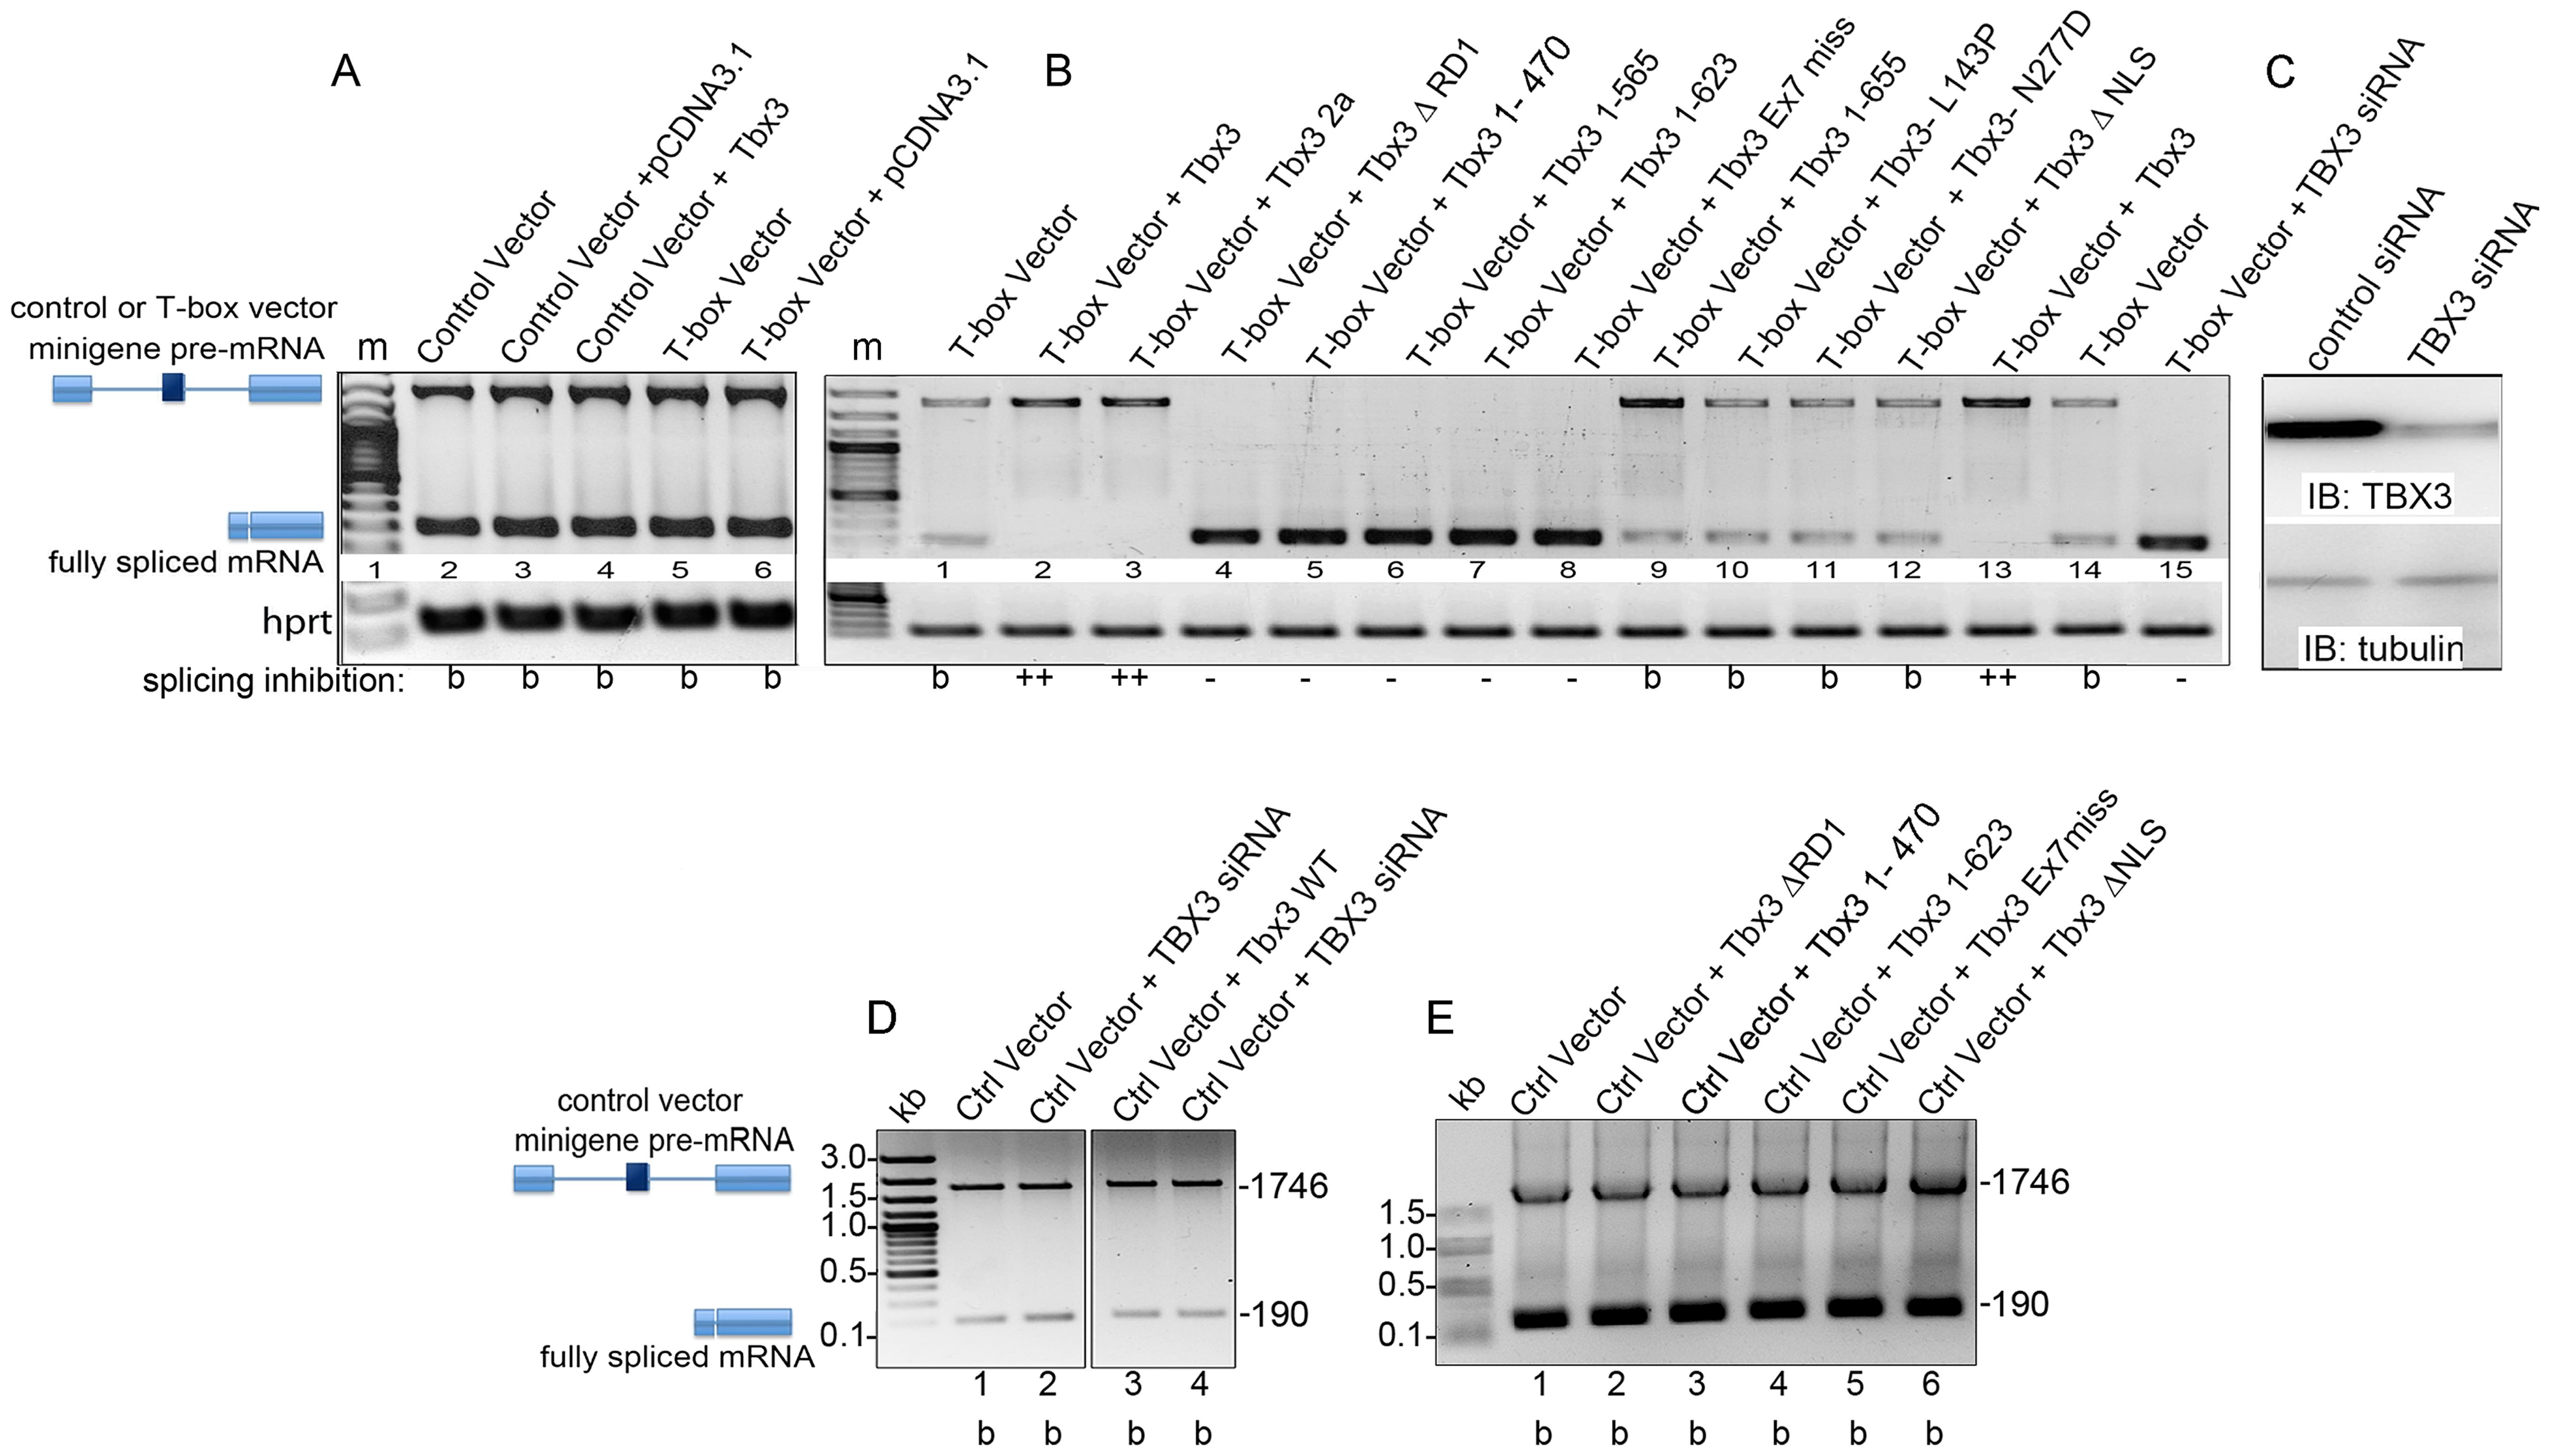 Tbx3 regulates alternative splicing <i>in vitro</i>.